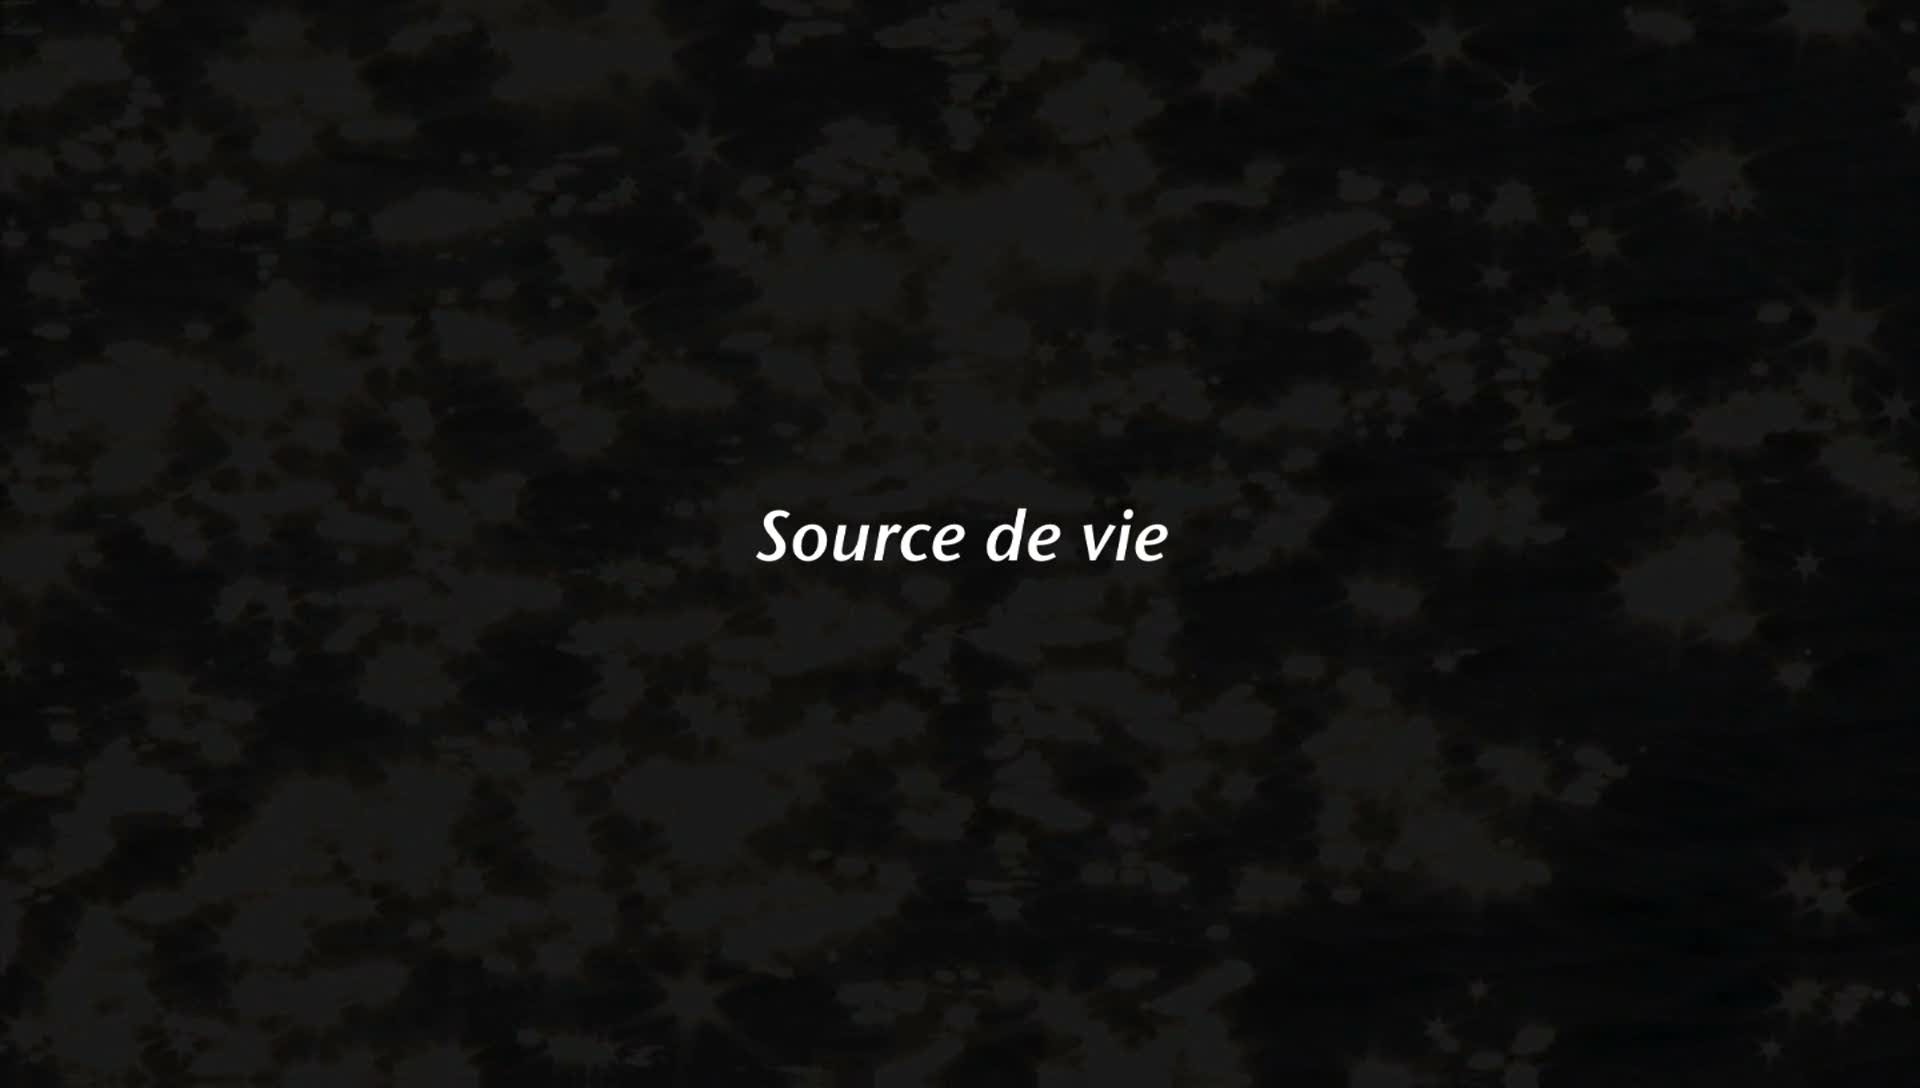 Source de vie